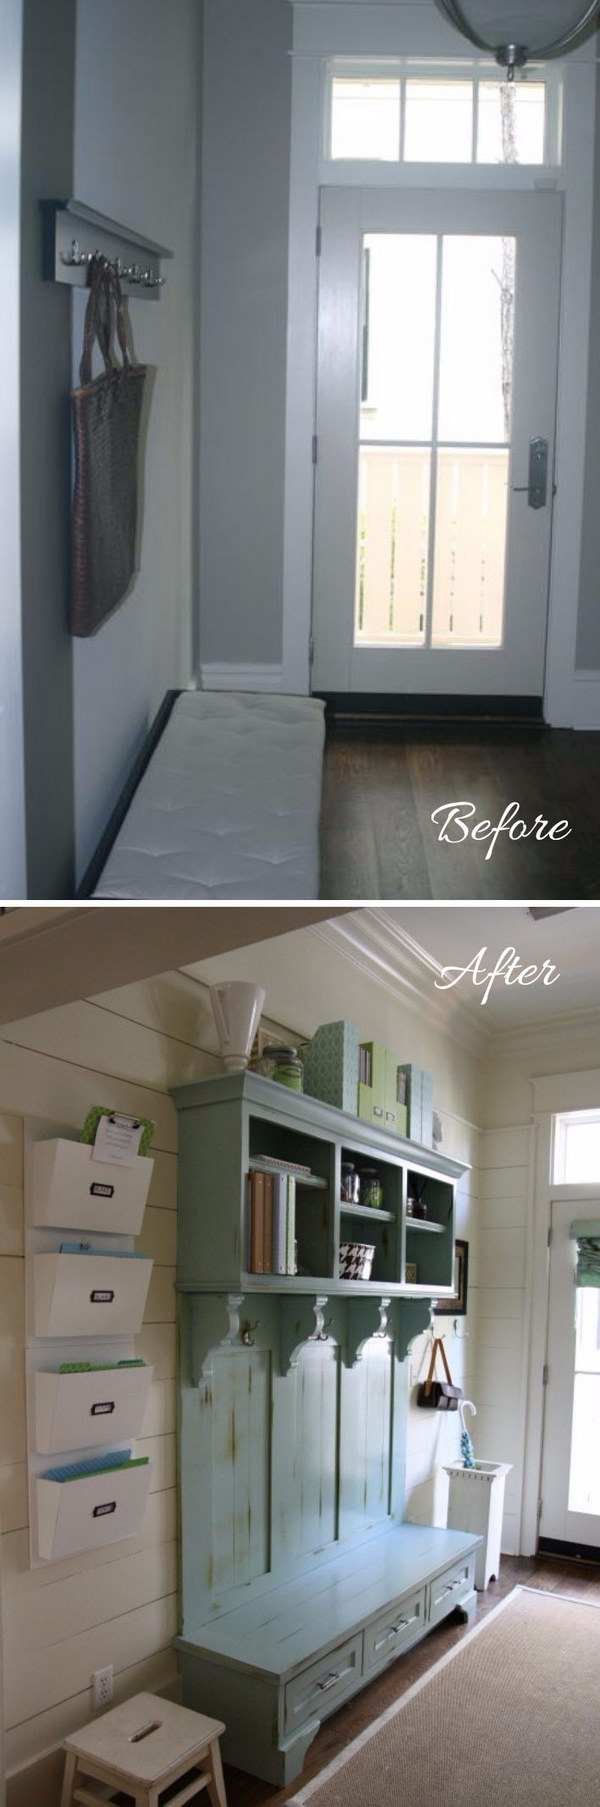 14 entryway makeover diy ideas tutorials - 30+ DIY Ideas to Give a Makeover to a Your Entryway